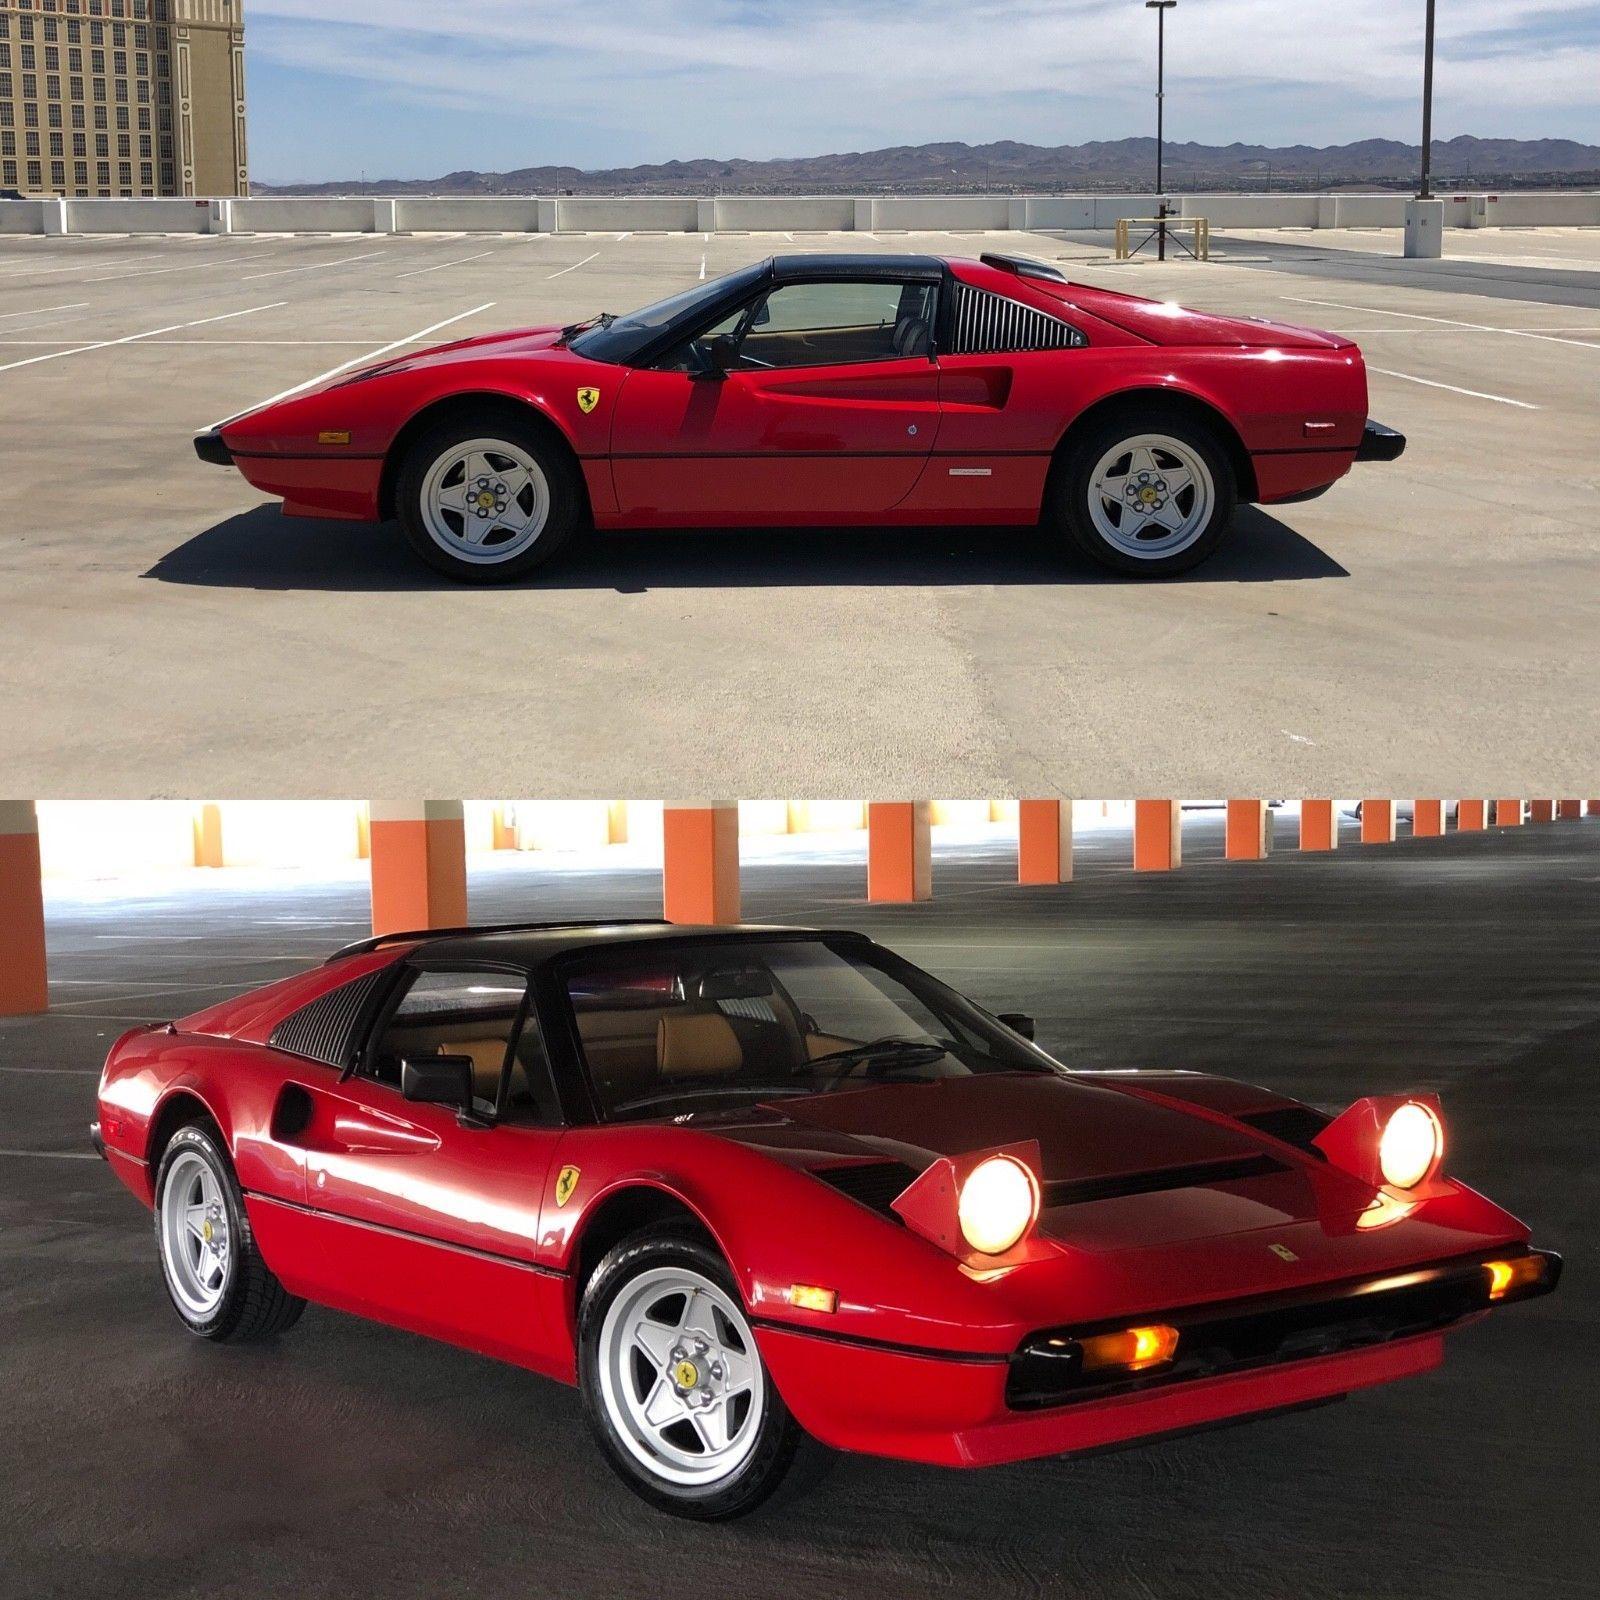 Amazing 1983 Ferrari 308 Gtsi No Reserve Targa Mint Condition 40k Miles California Car 2018